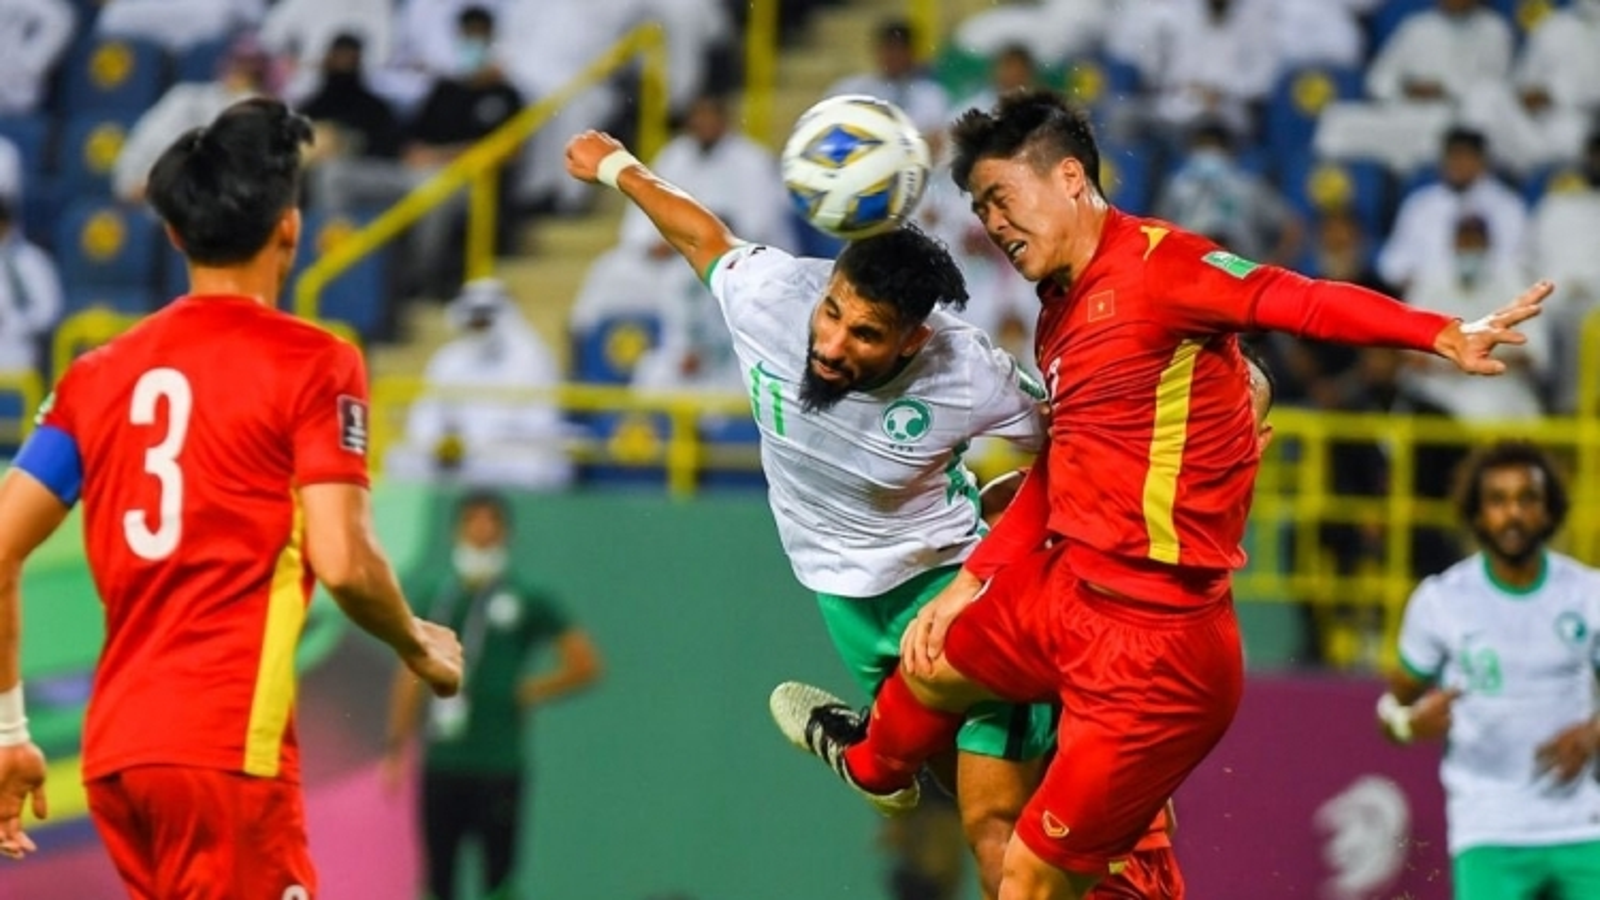 10-man Vietnam overwhelmed 1-3 by hosts Saudi Arabia in WC qualifier